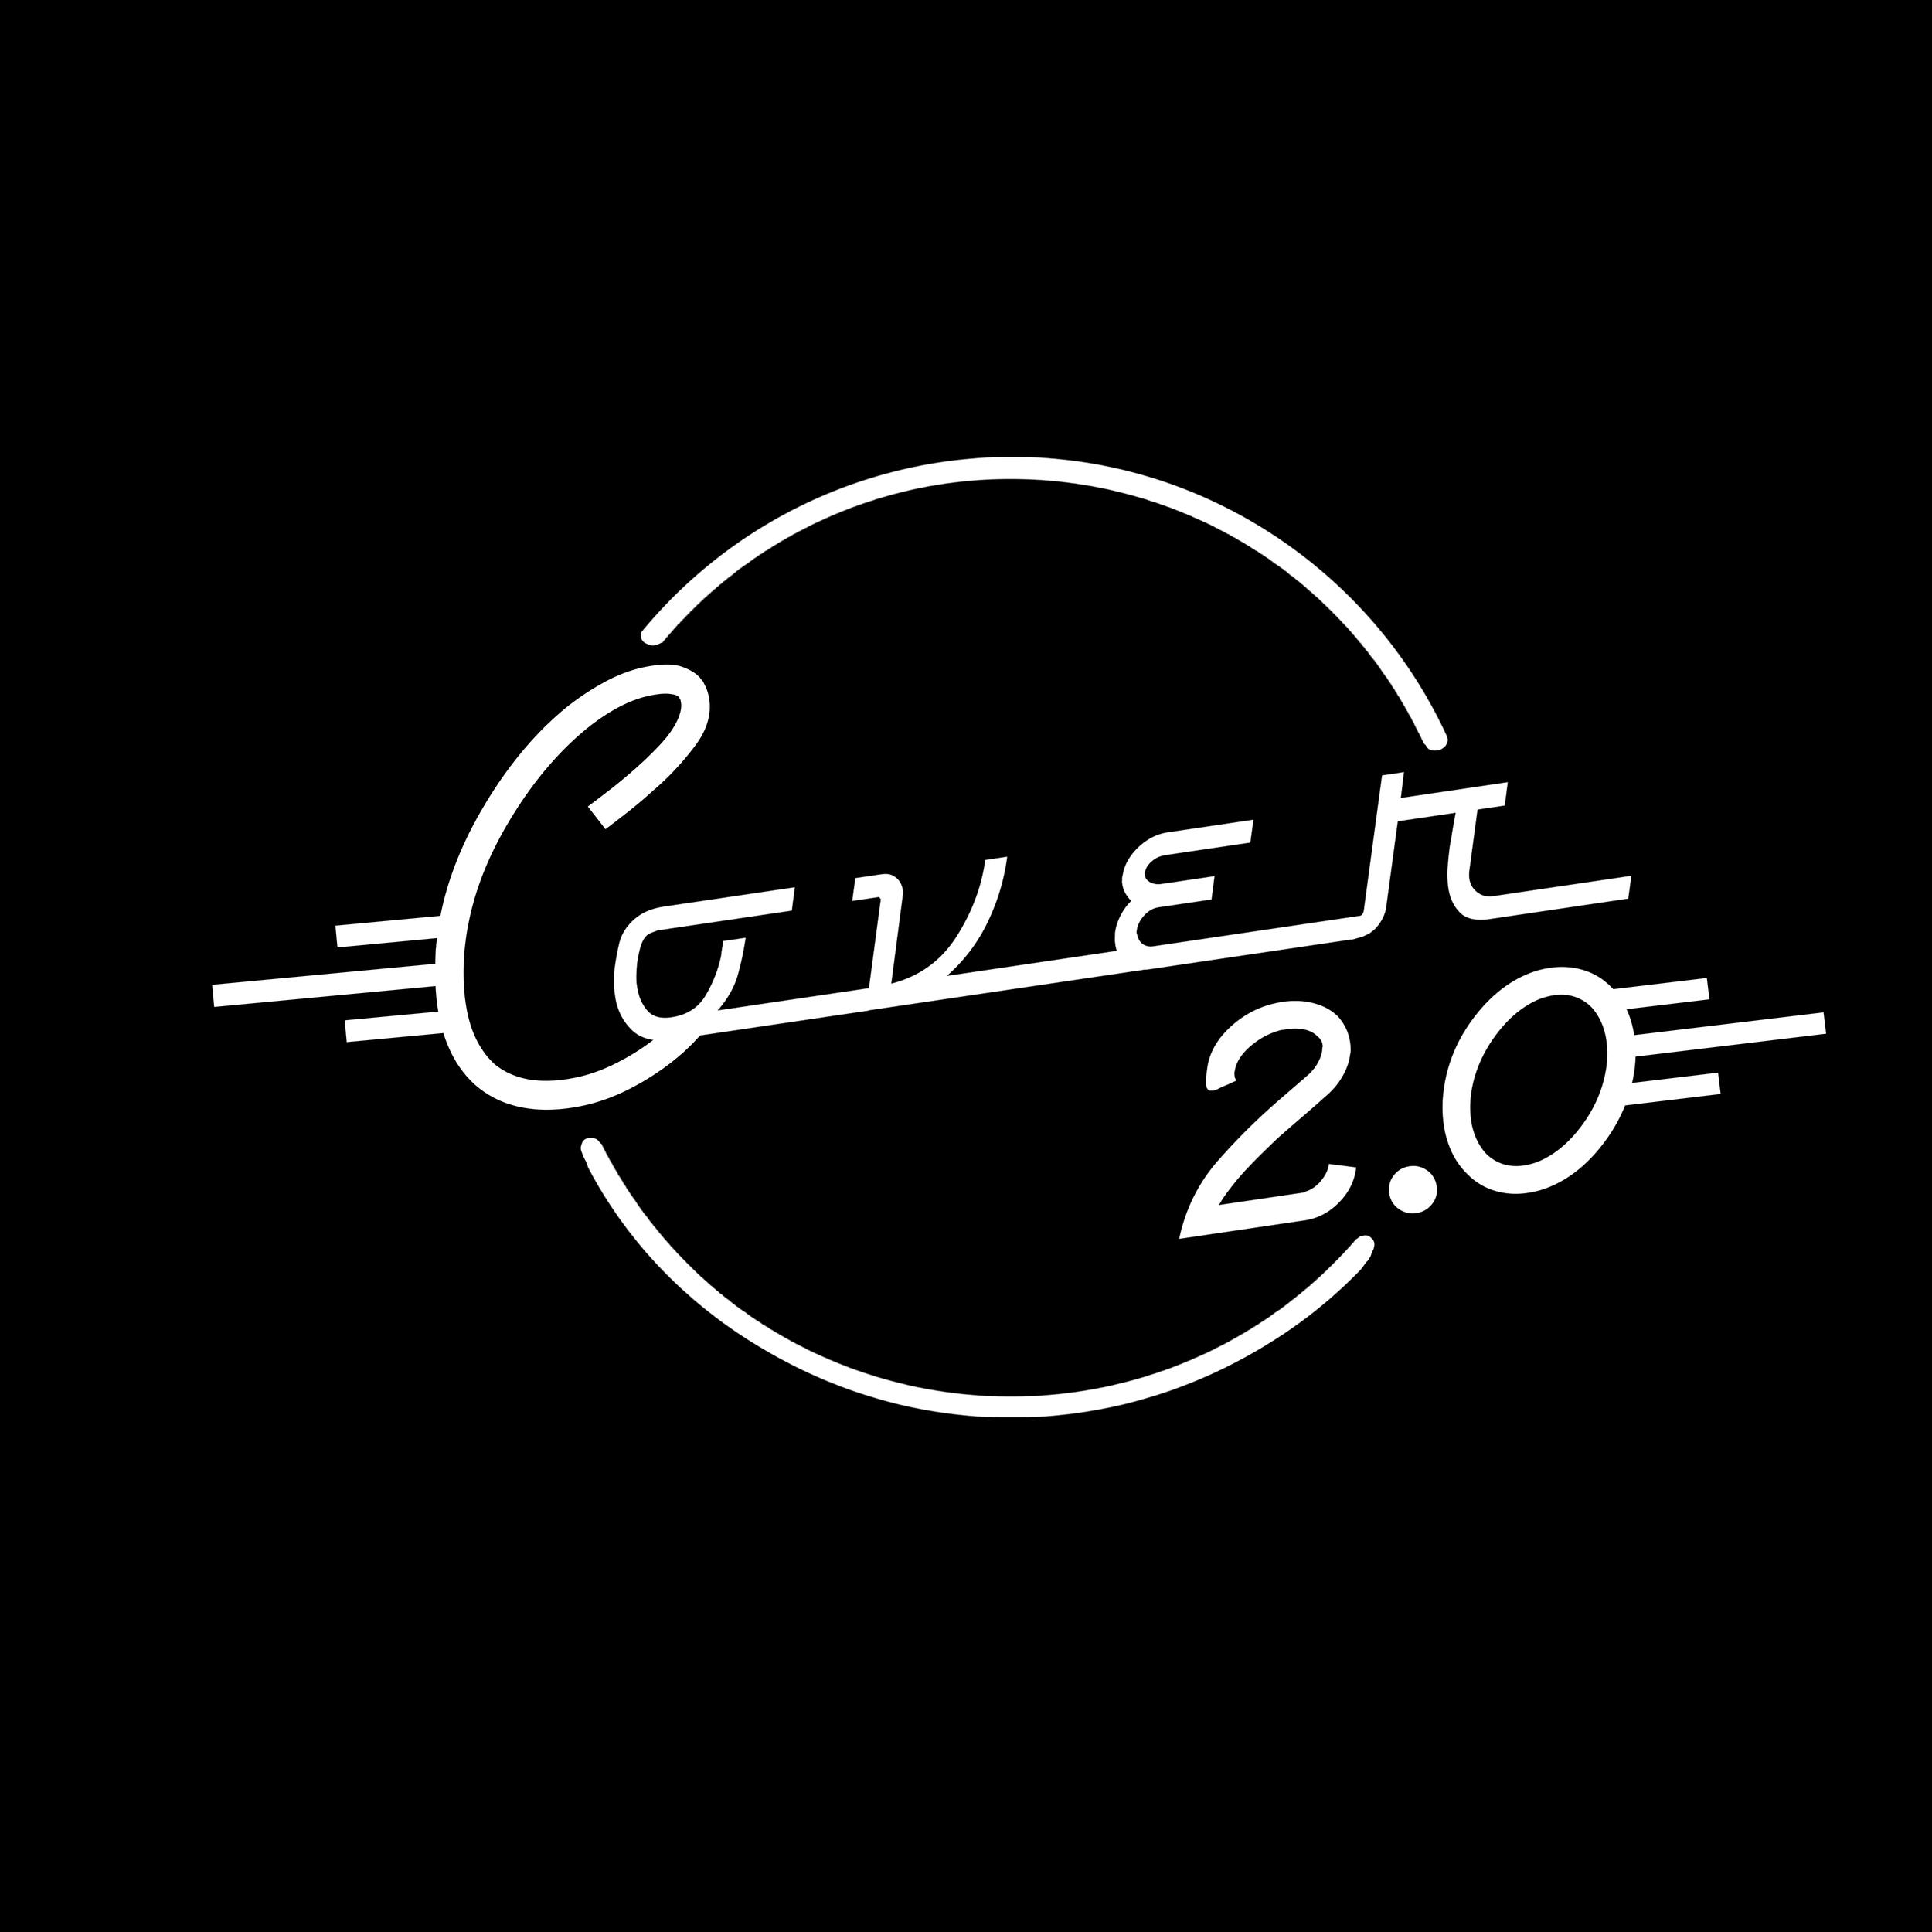 LOGO NOIR - Cover 2.0.png